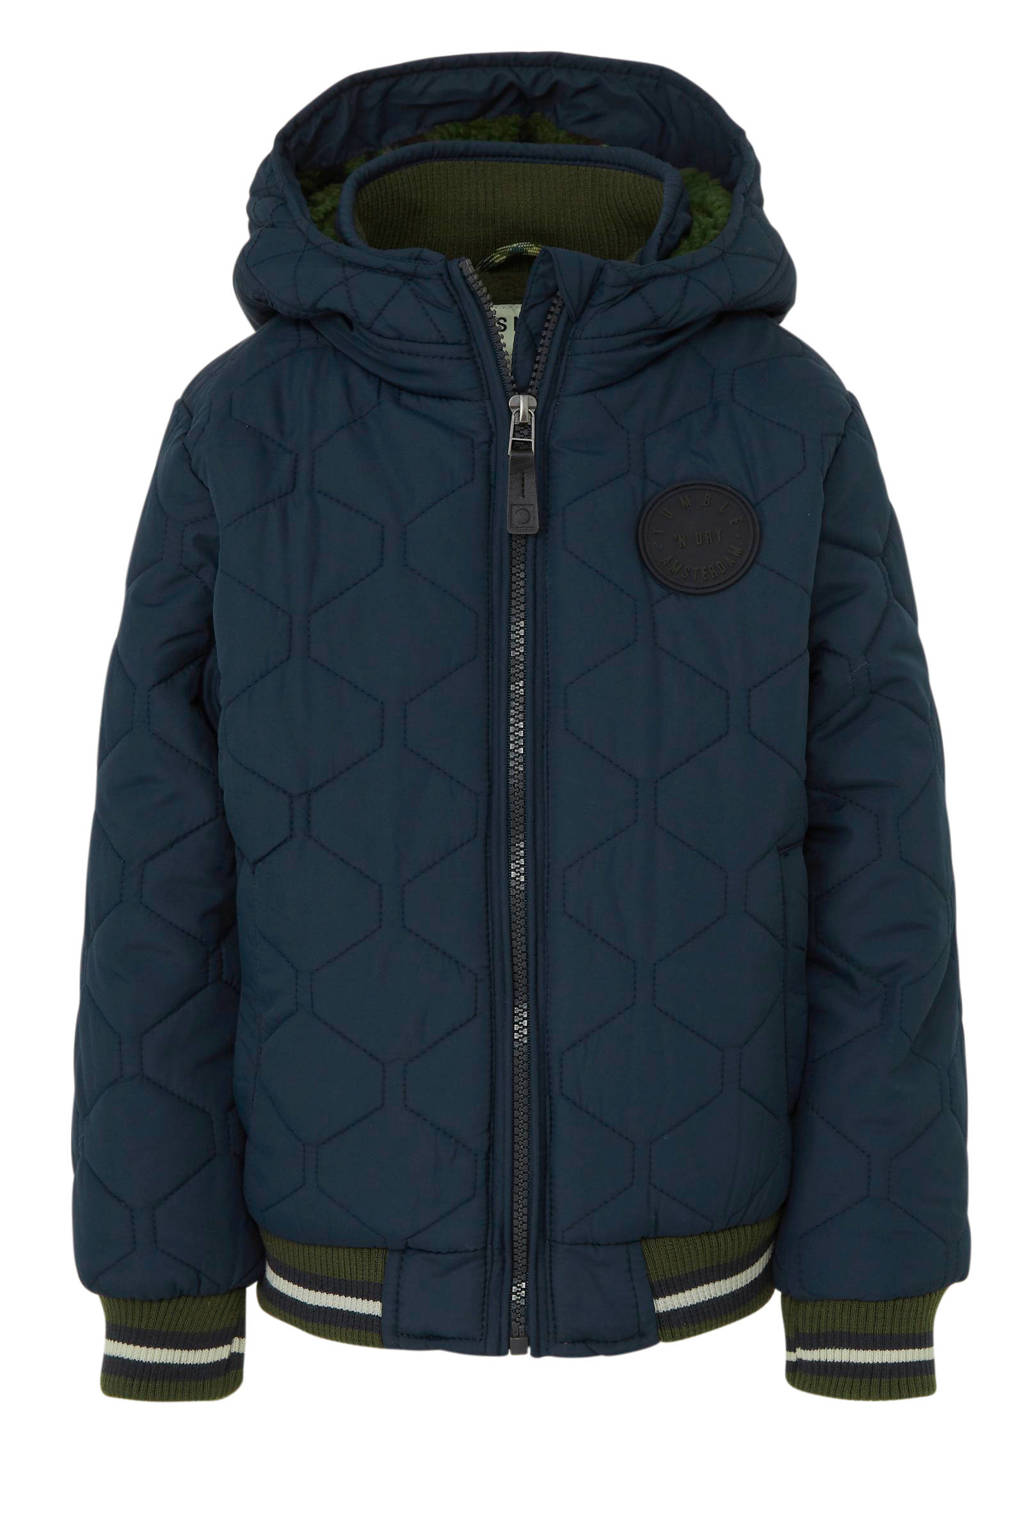 Tumble 'n Dry Lo winterjas navy blazer, Navy Blazer